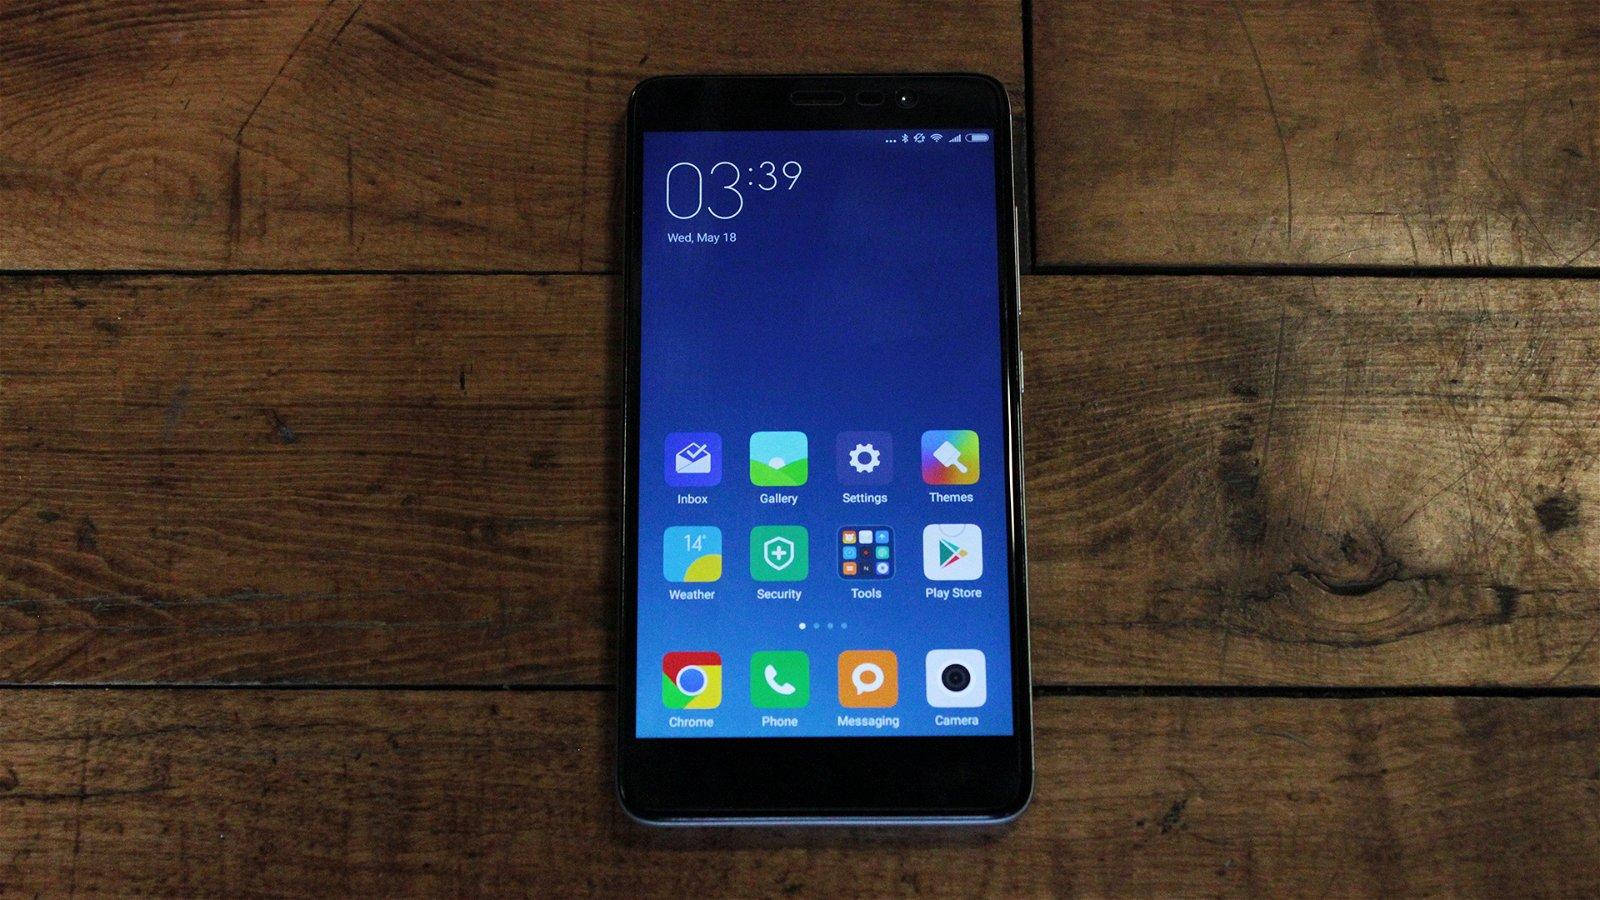 Xiaomi Redmi Note 3 Pro (Hardware) Review